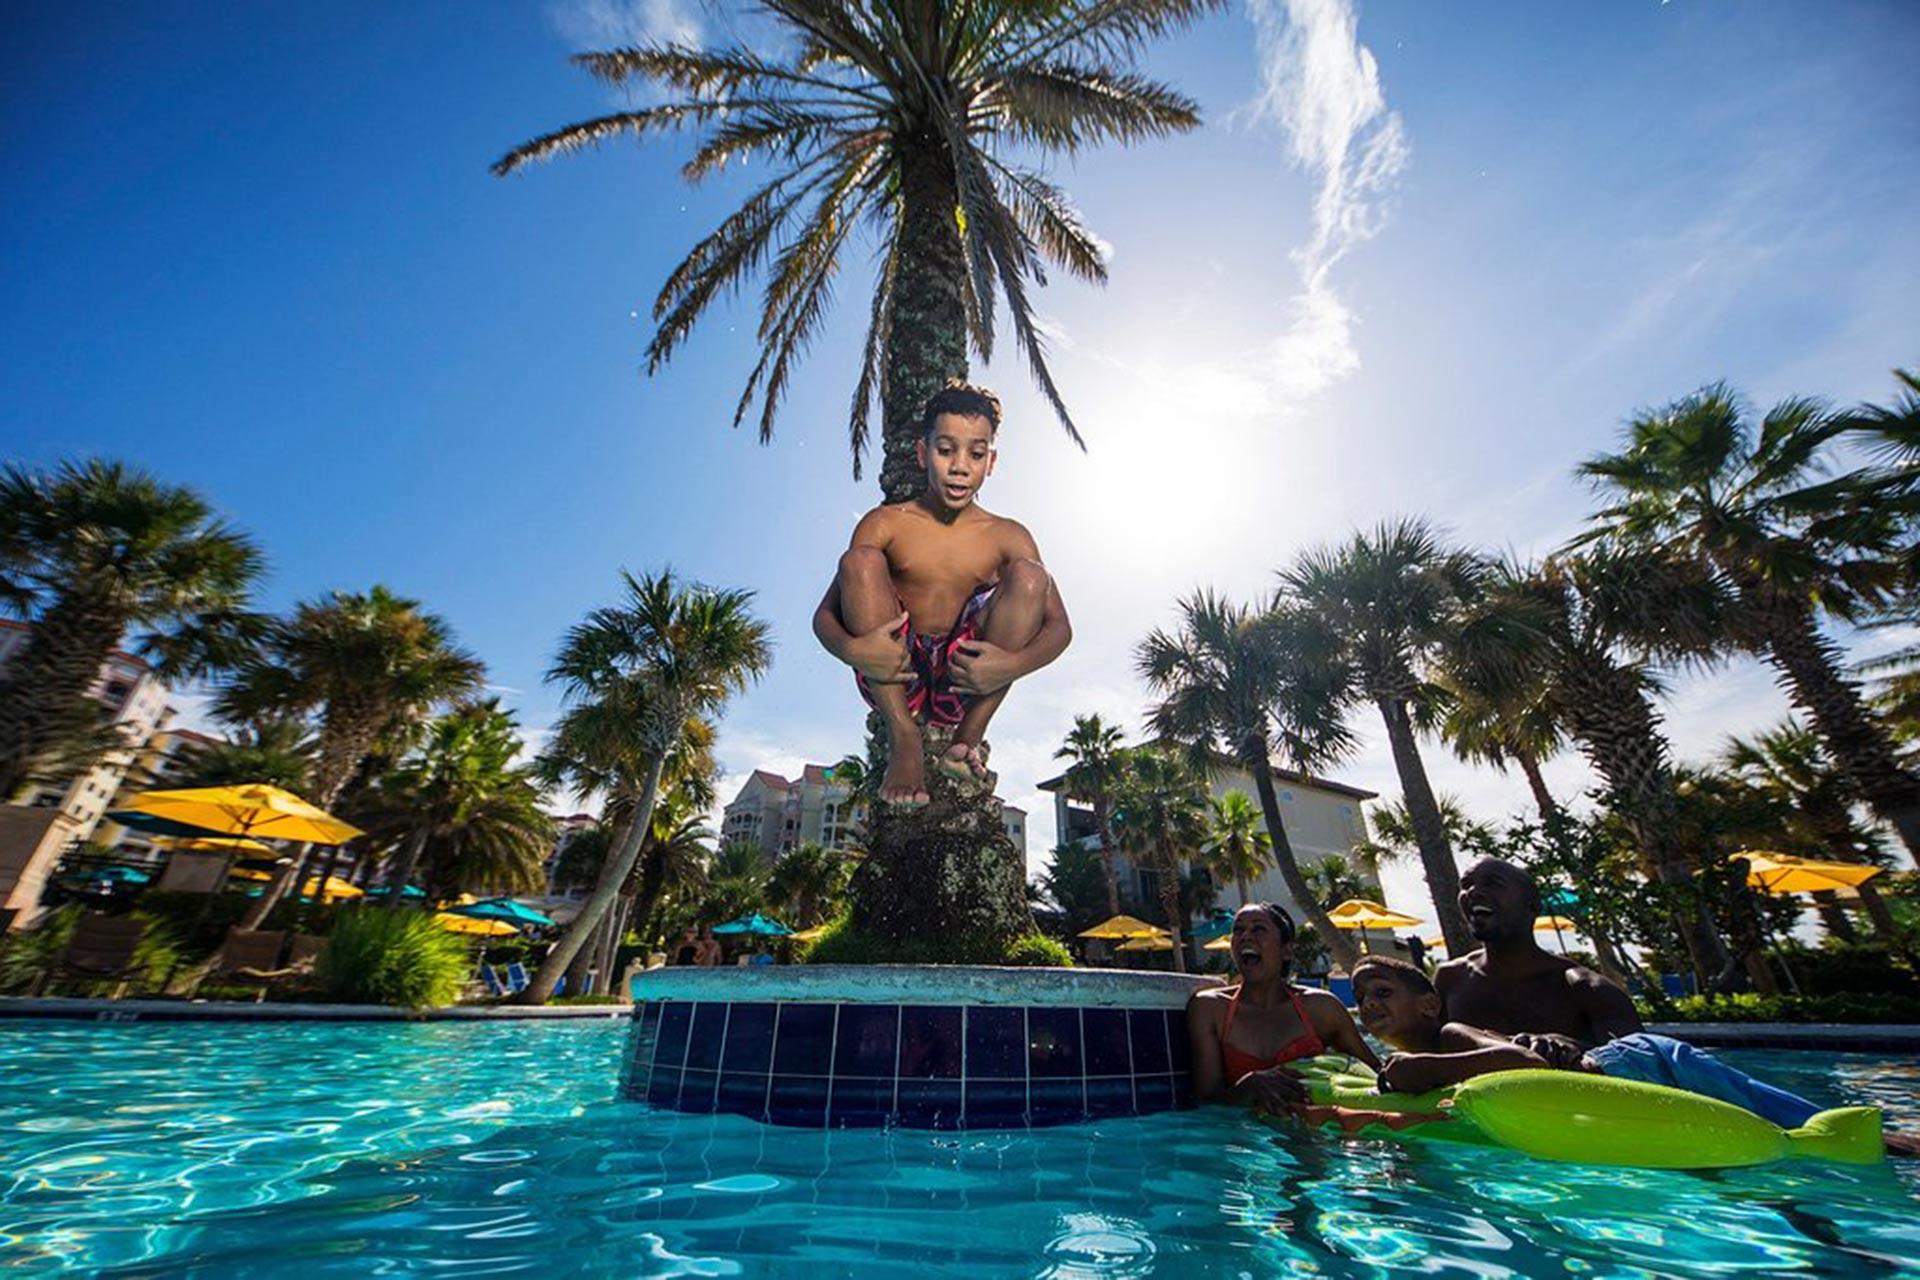 Boy Jumping in Pool at Hammock Beach Resort; Courtesy of Hammock Beach Resort